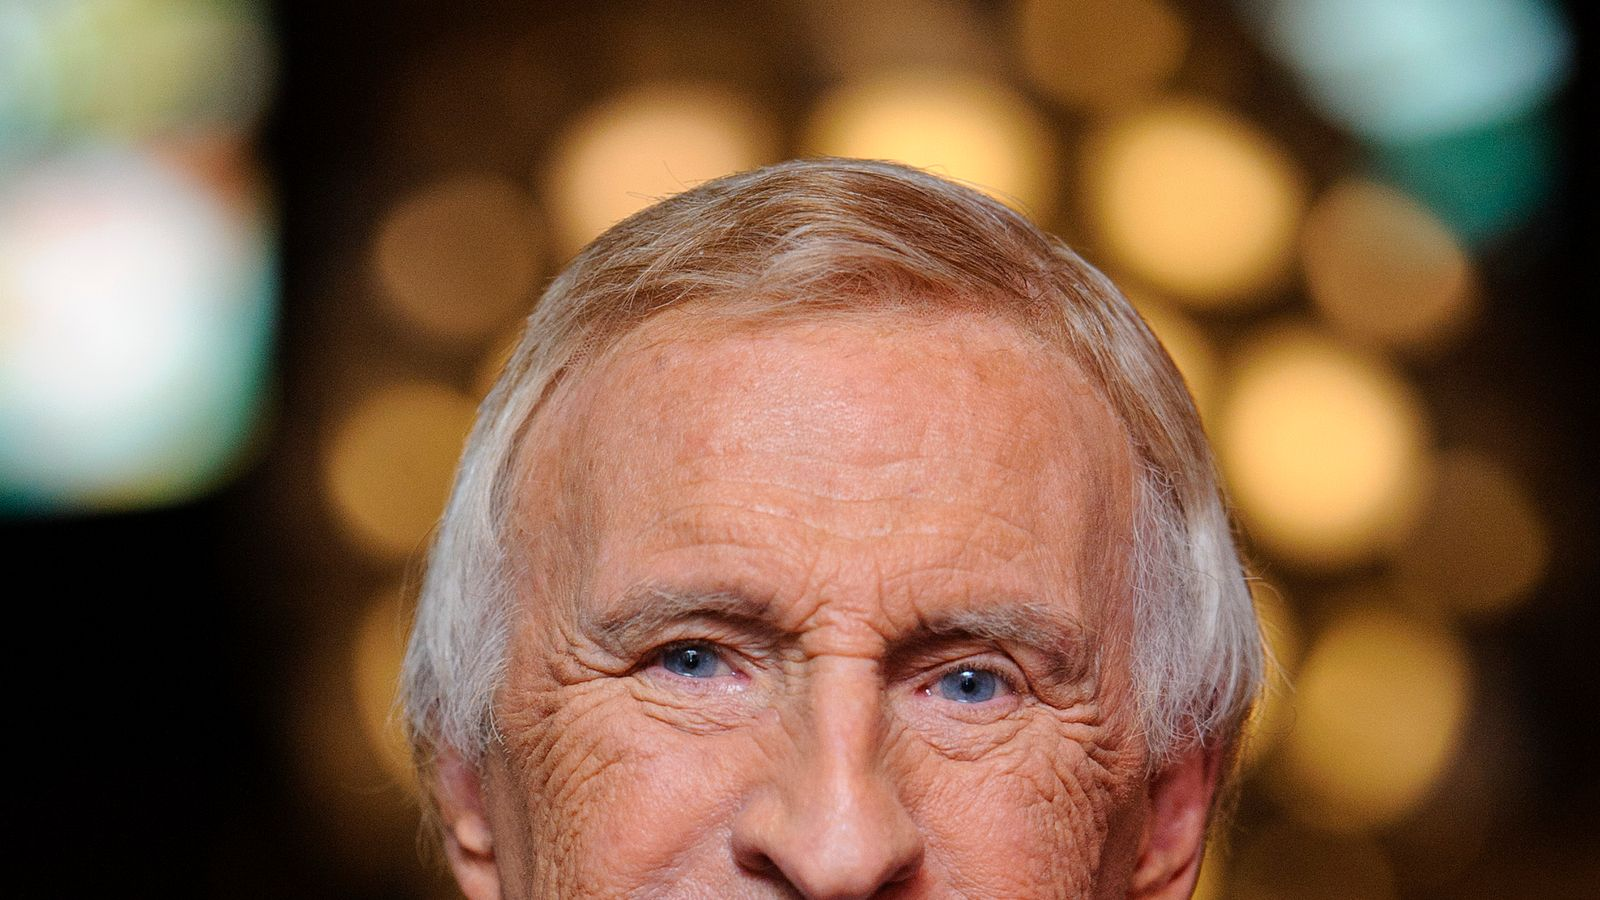 Television legend Sir Bruce Forsyth dies aged 89